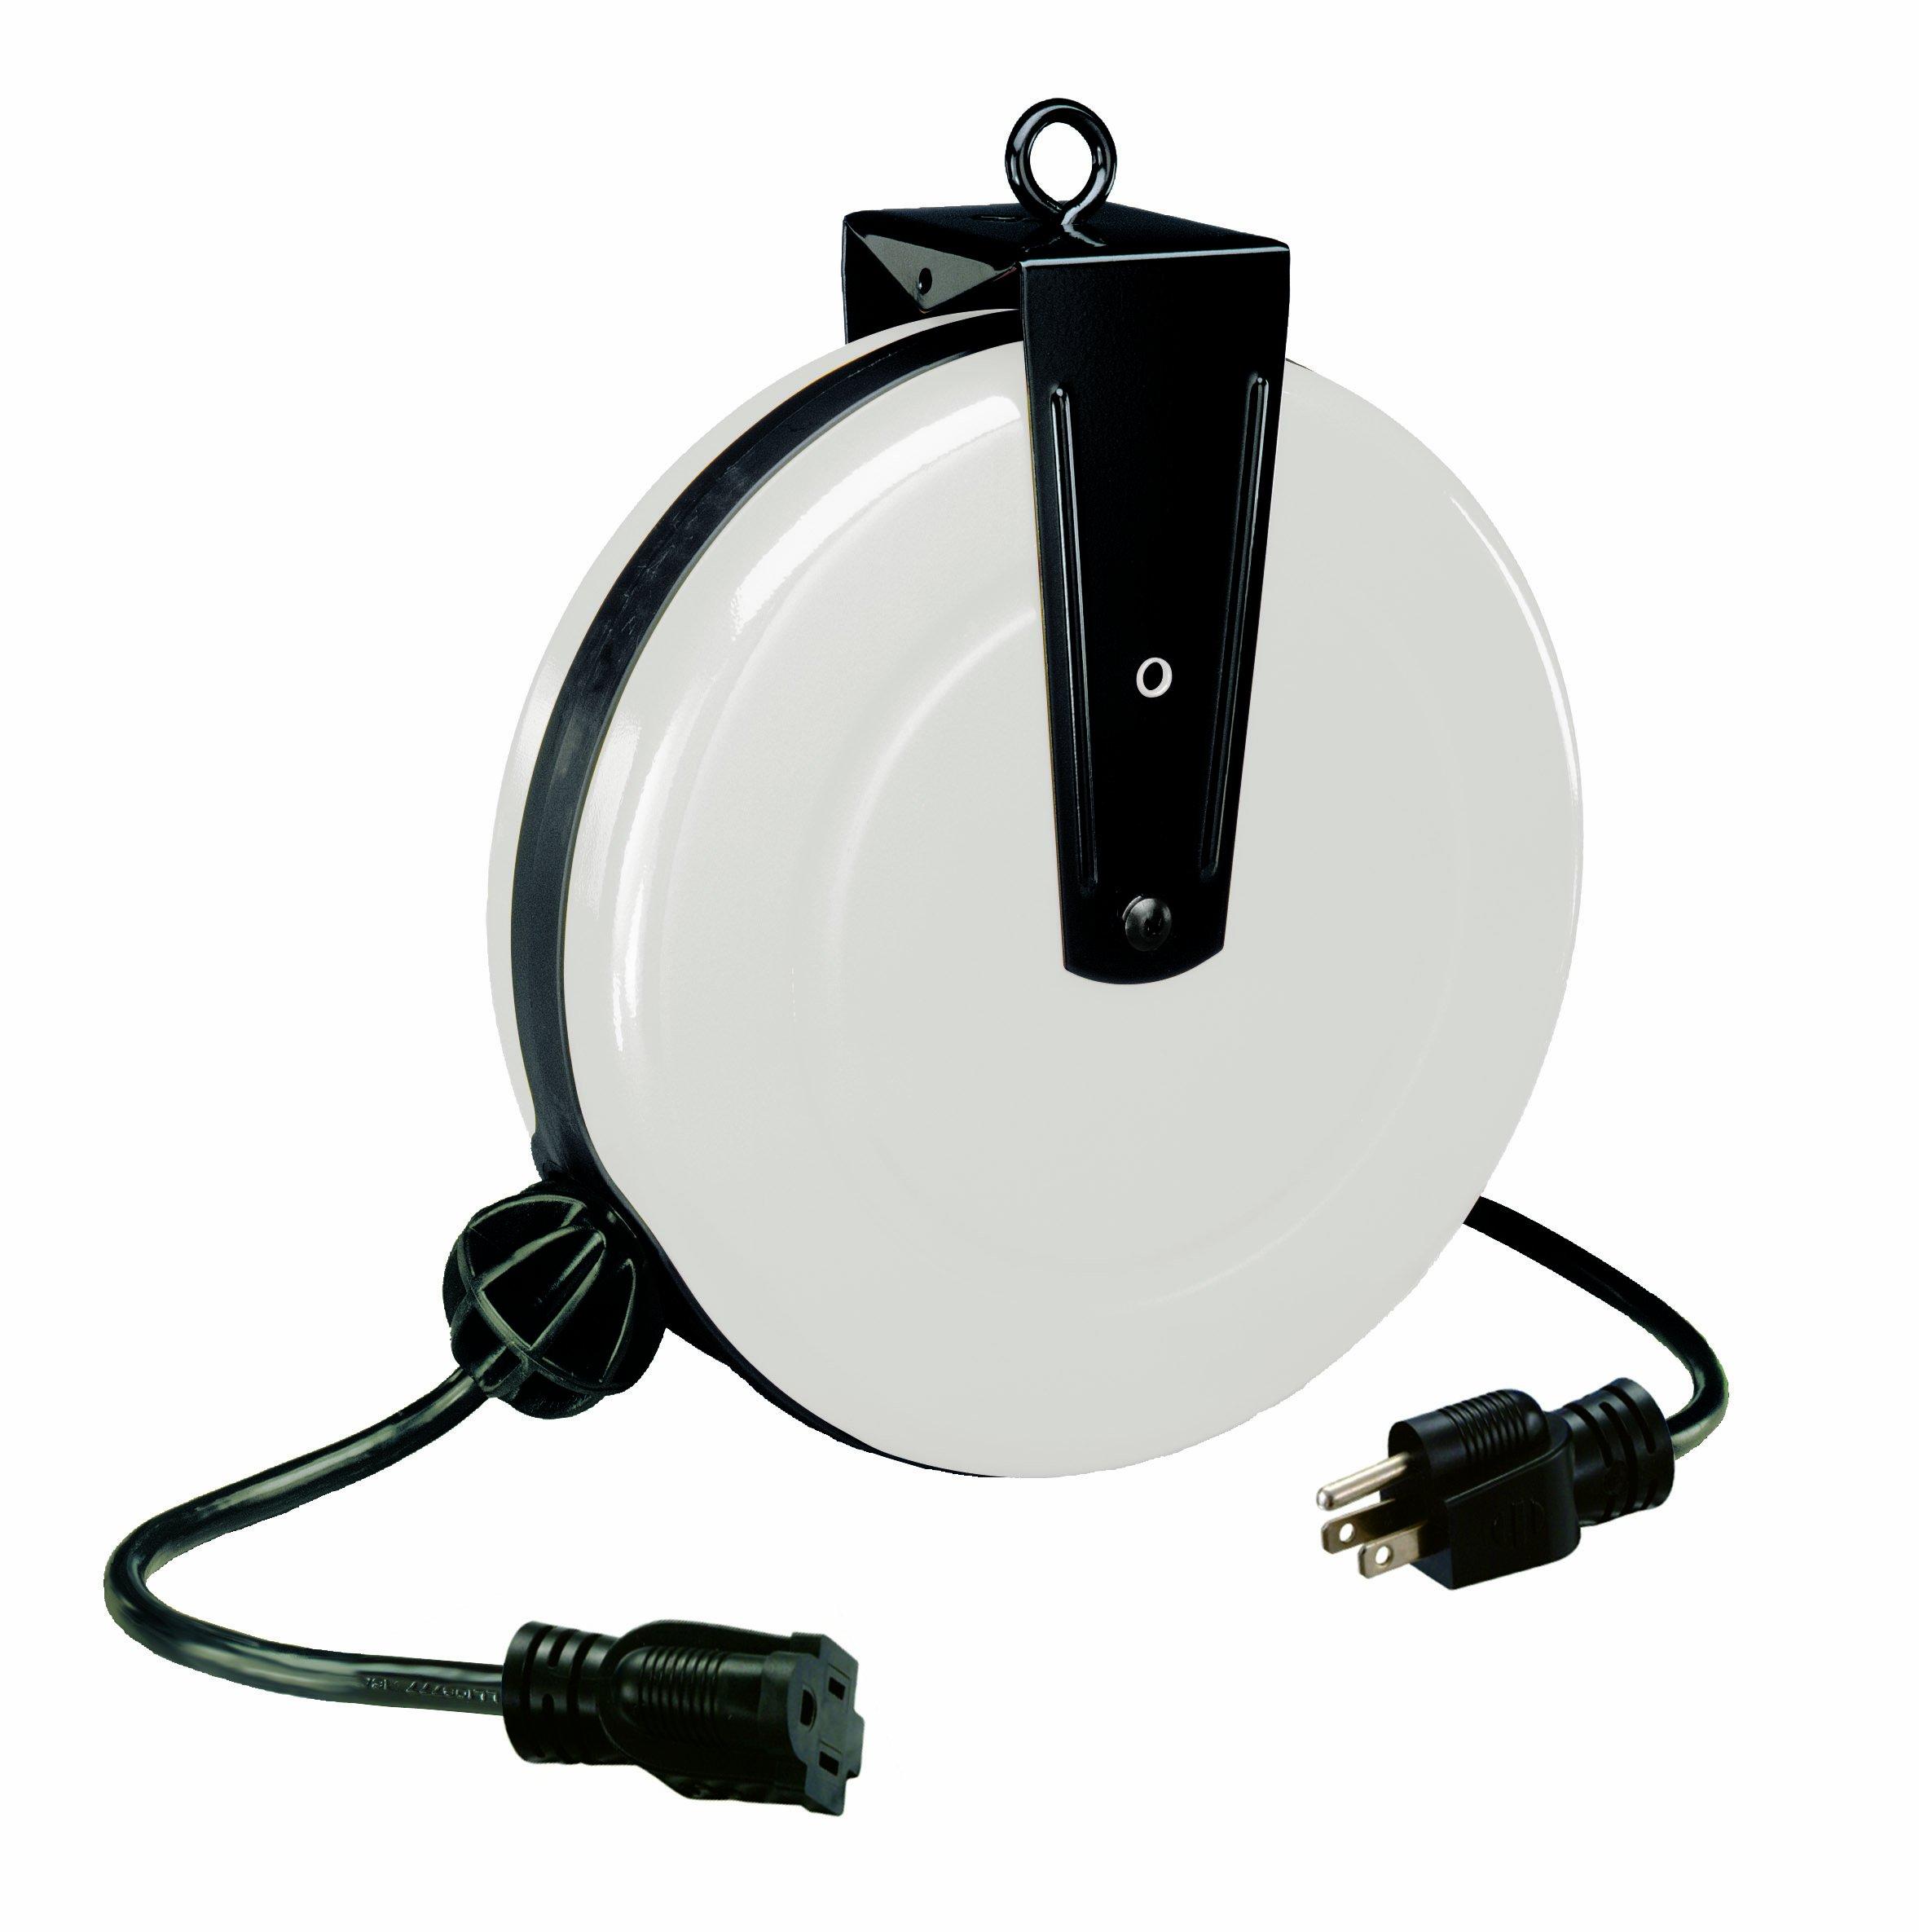 Alert Stamping 5000A-30GF-S 30-Feet Single Tap Cord Reel